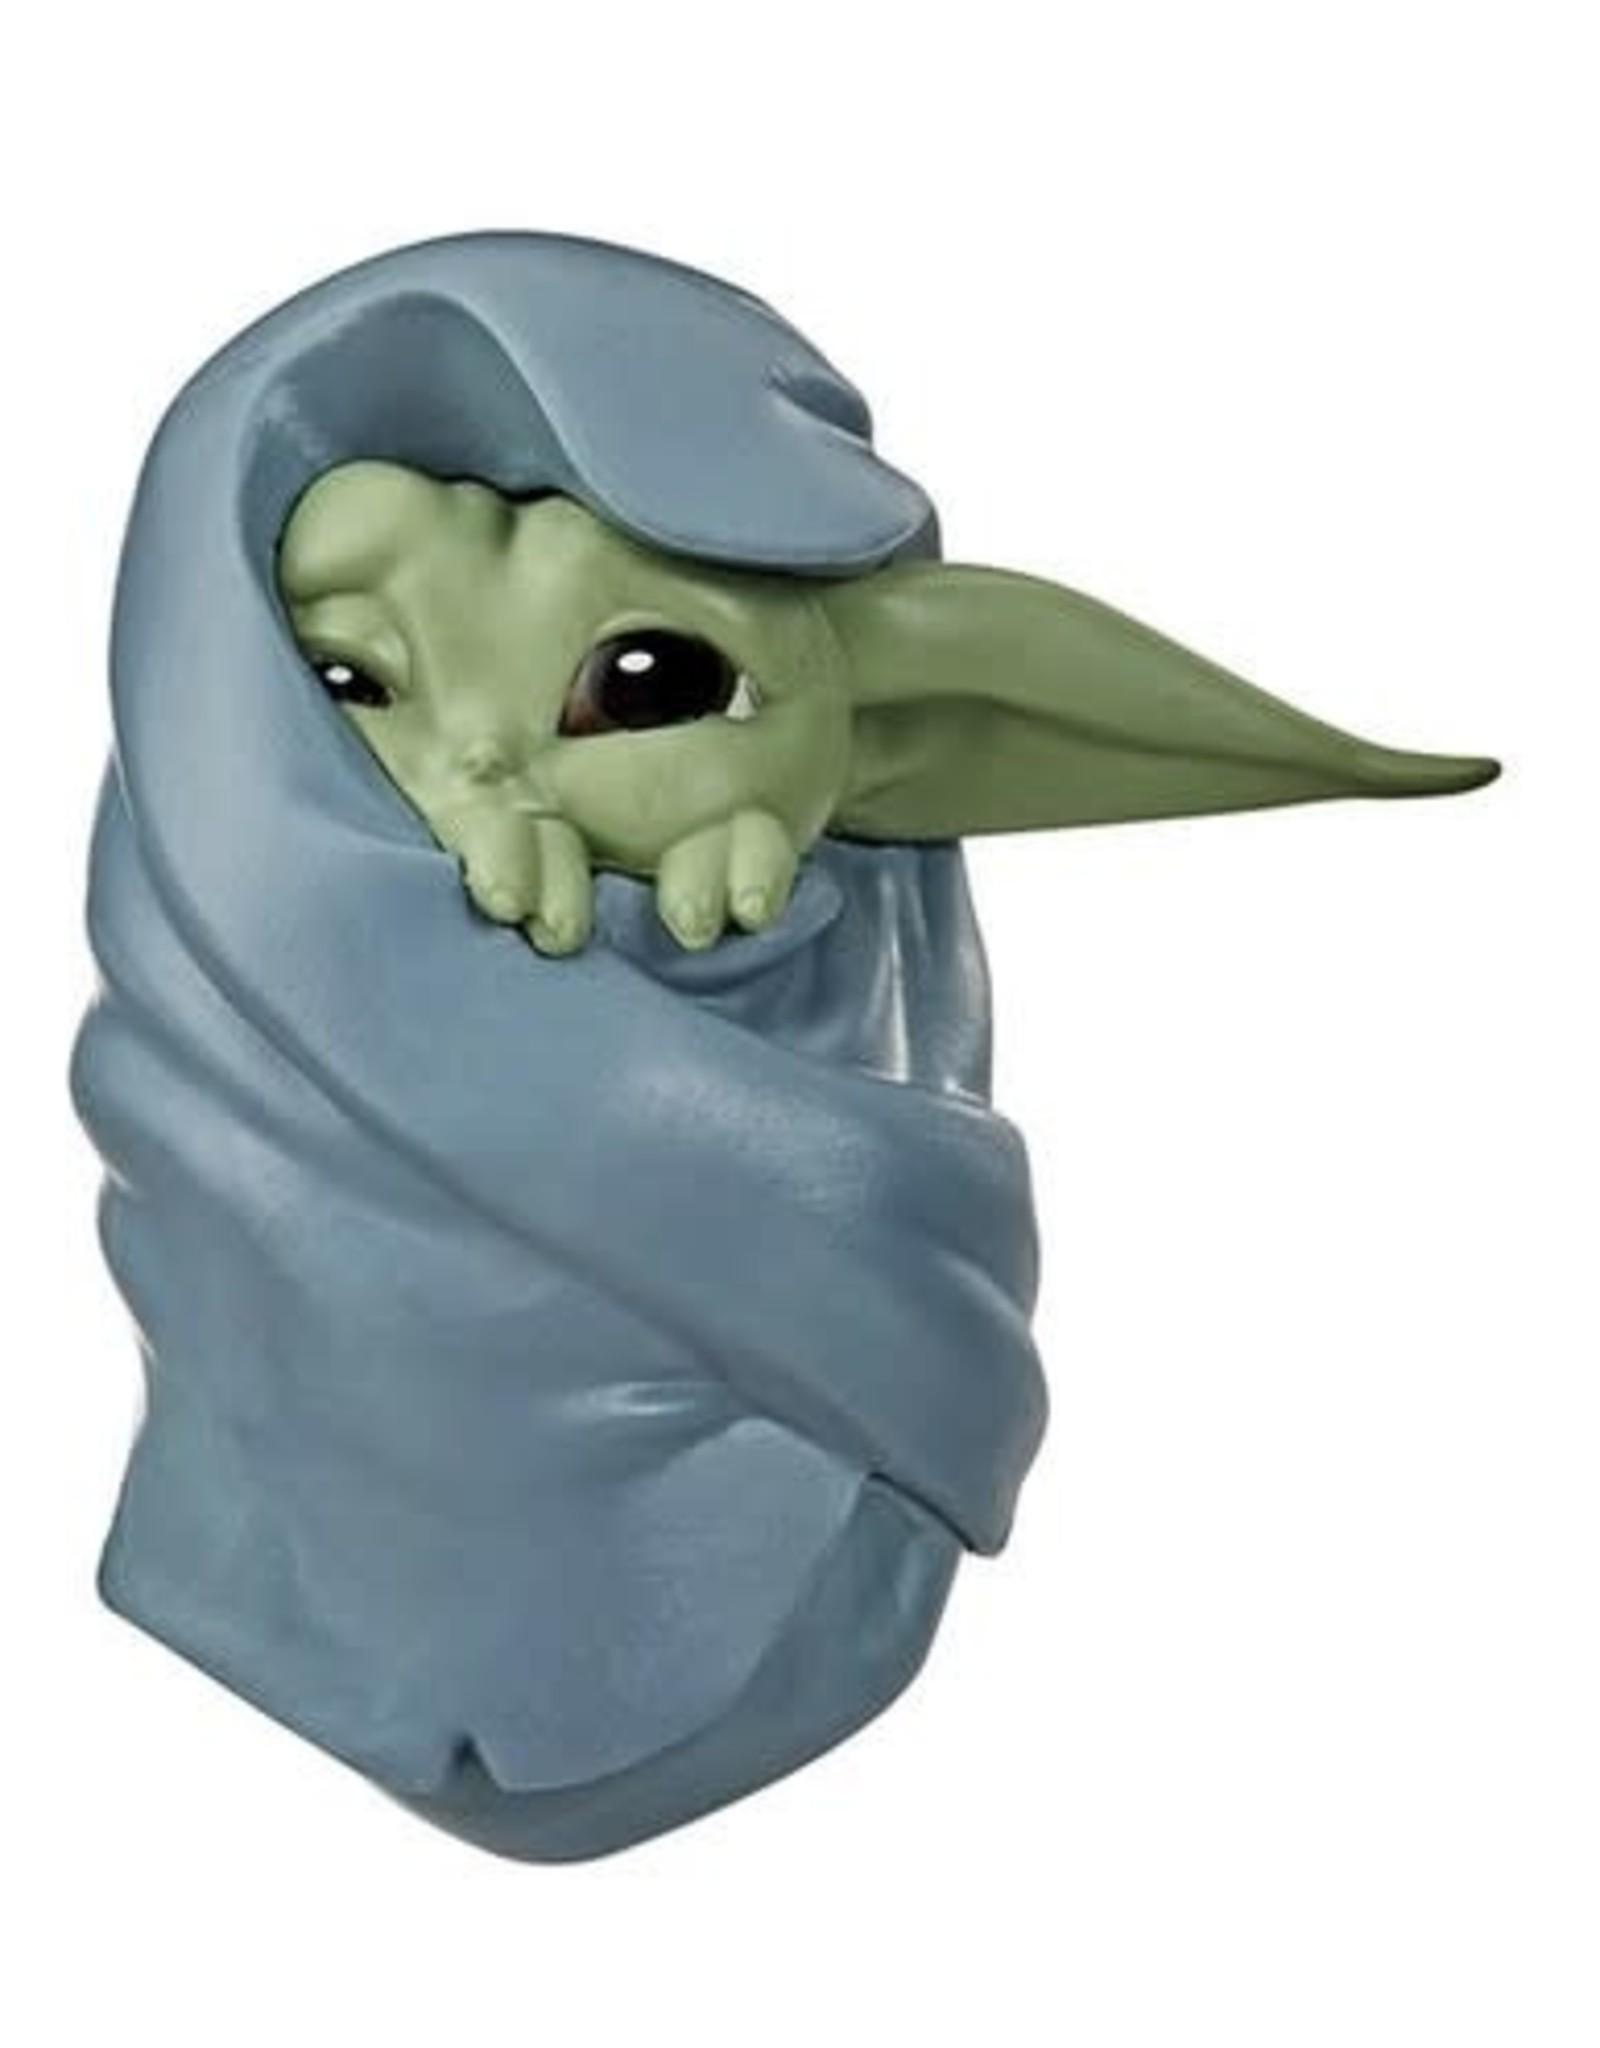 Hasbro Star Wars - Mandalorian the Child Bounty - Blanket